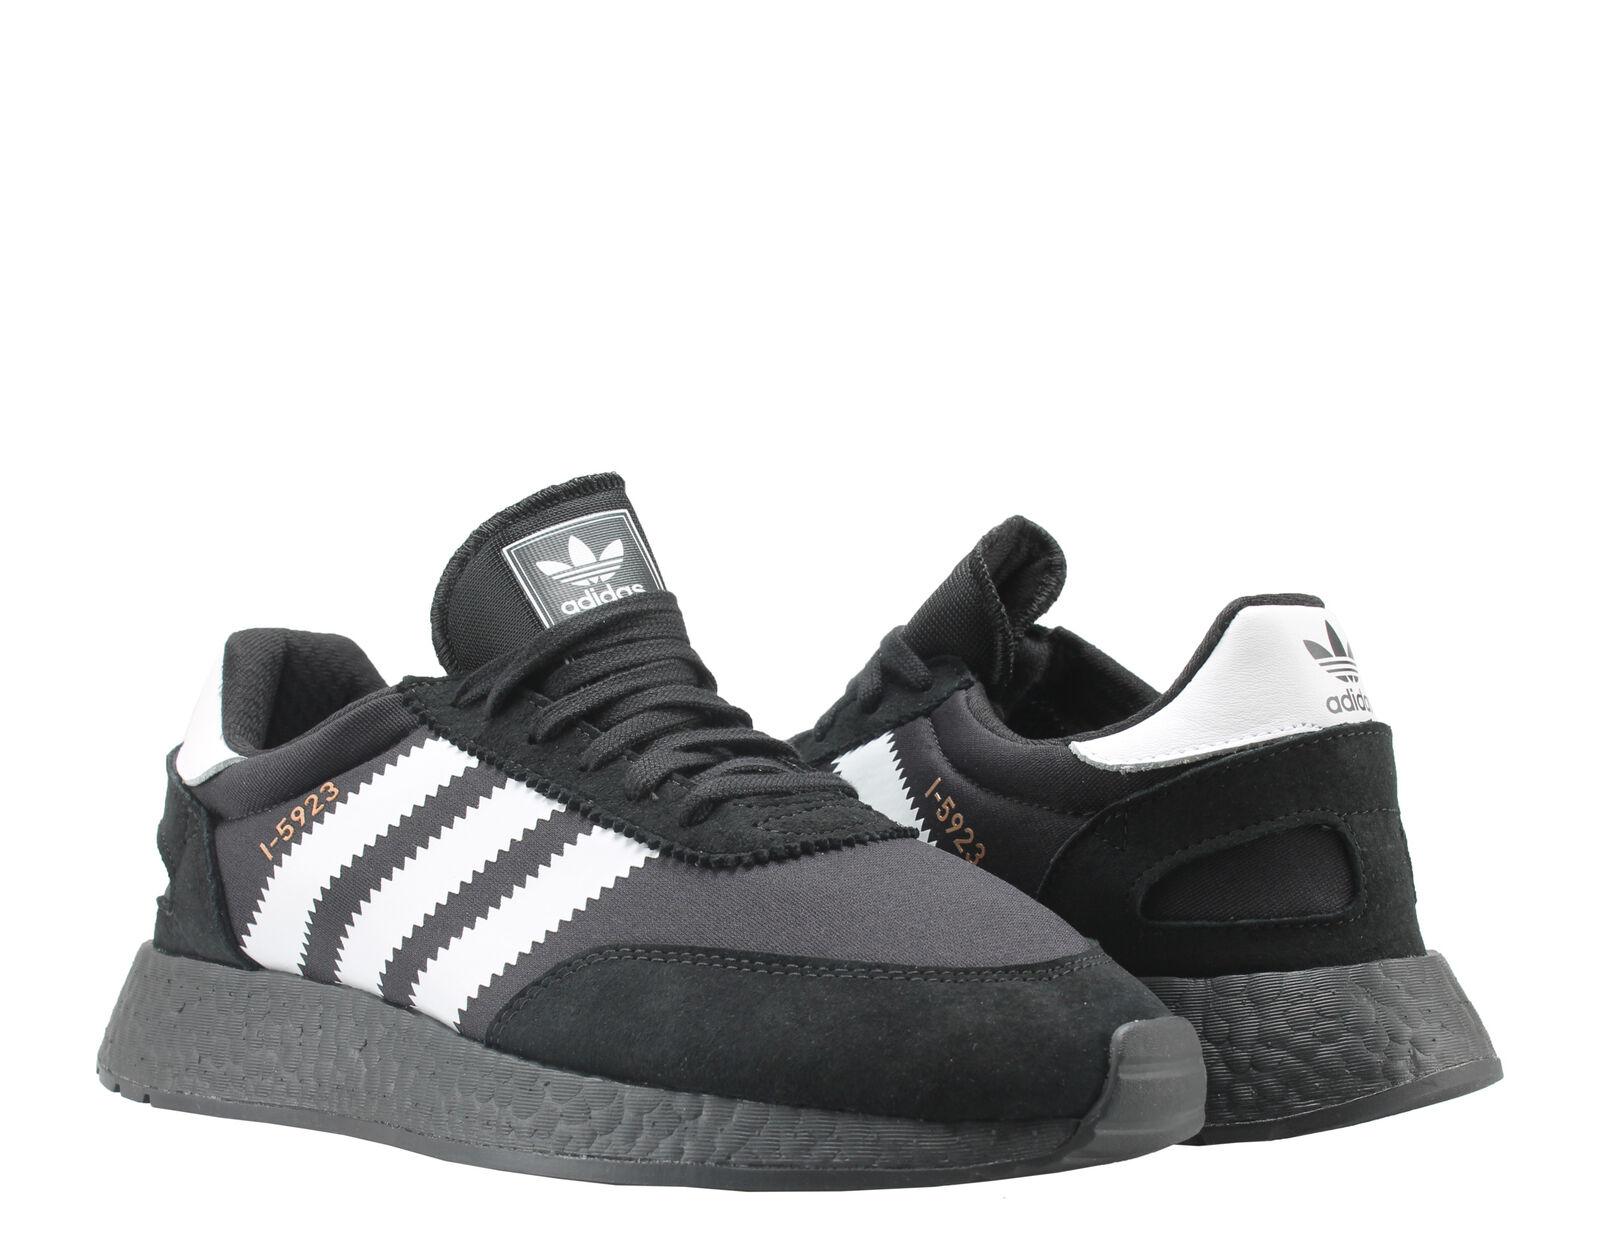 Adidas Originals I-5923 Iniki Runner Black/White Men's Running Shoes CQ2490